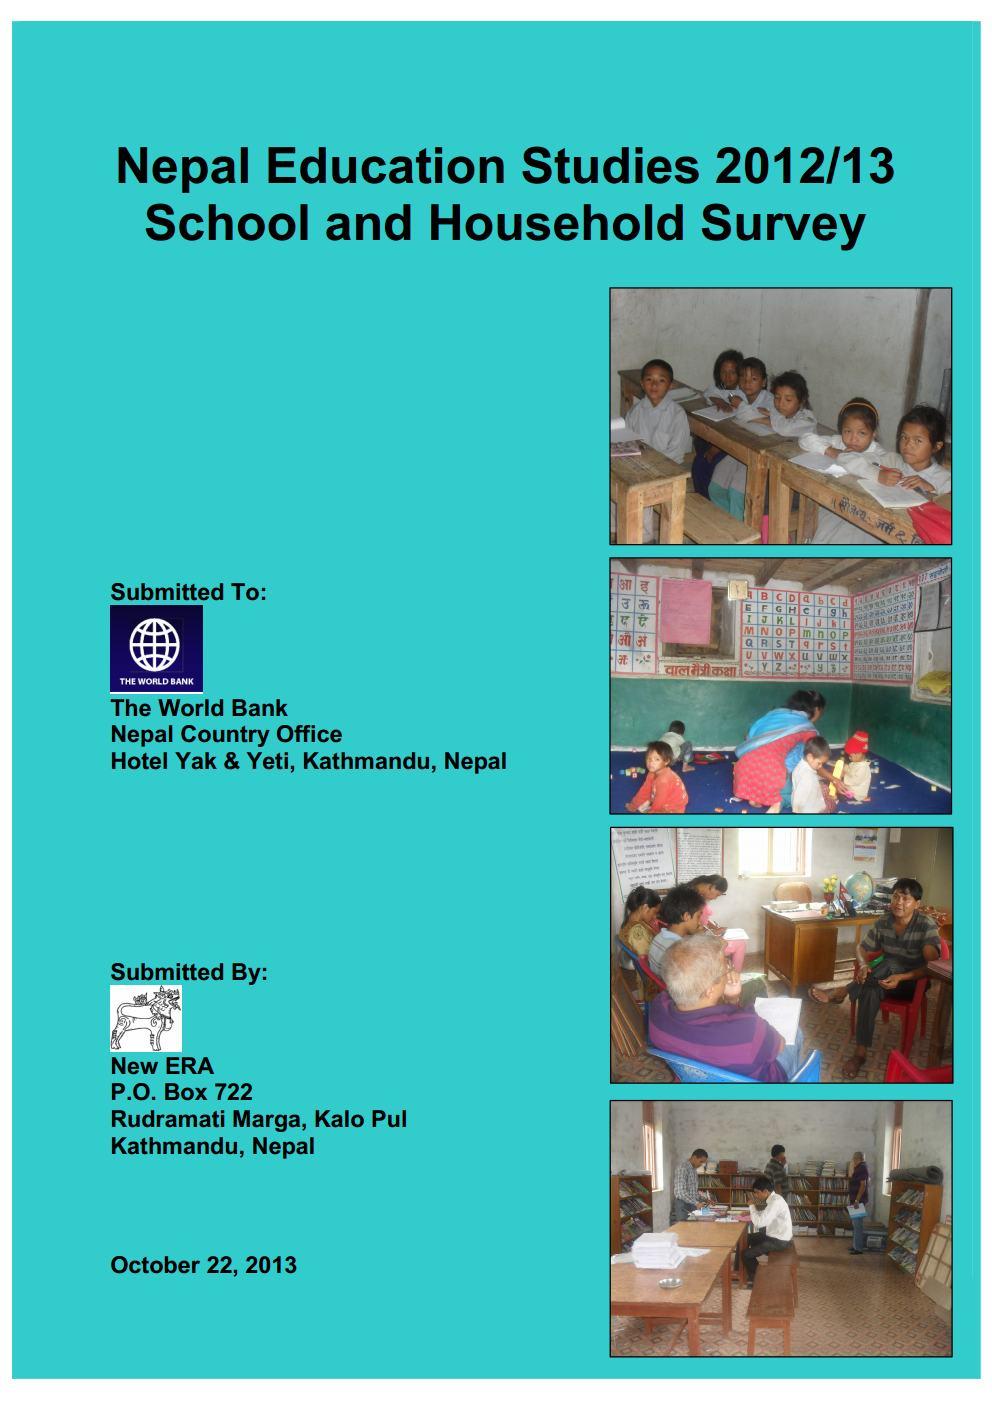 Nepal Education Studies 2012/13 – School and Household Surveys